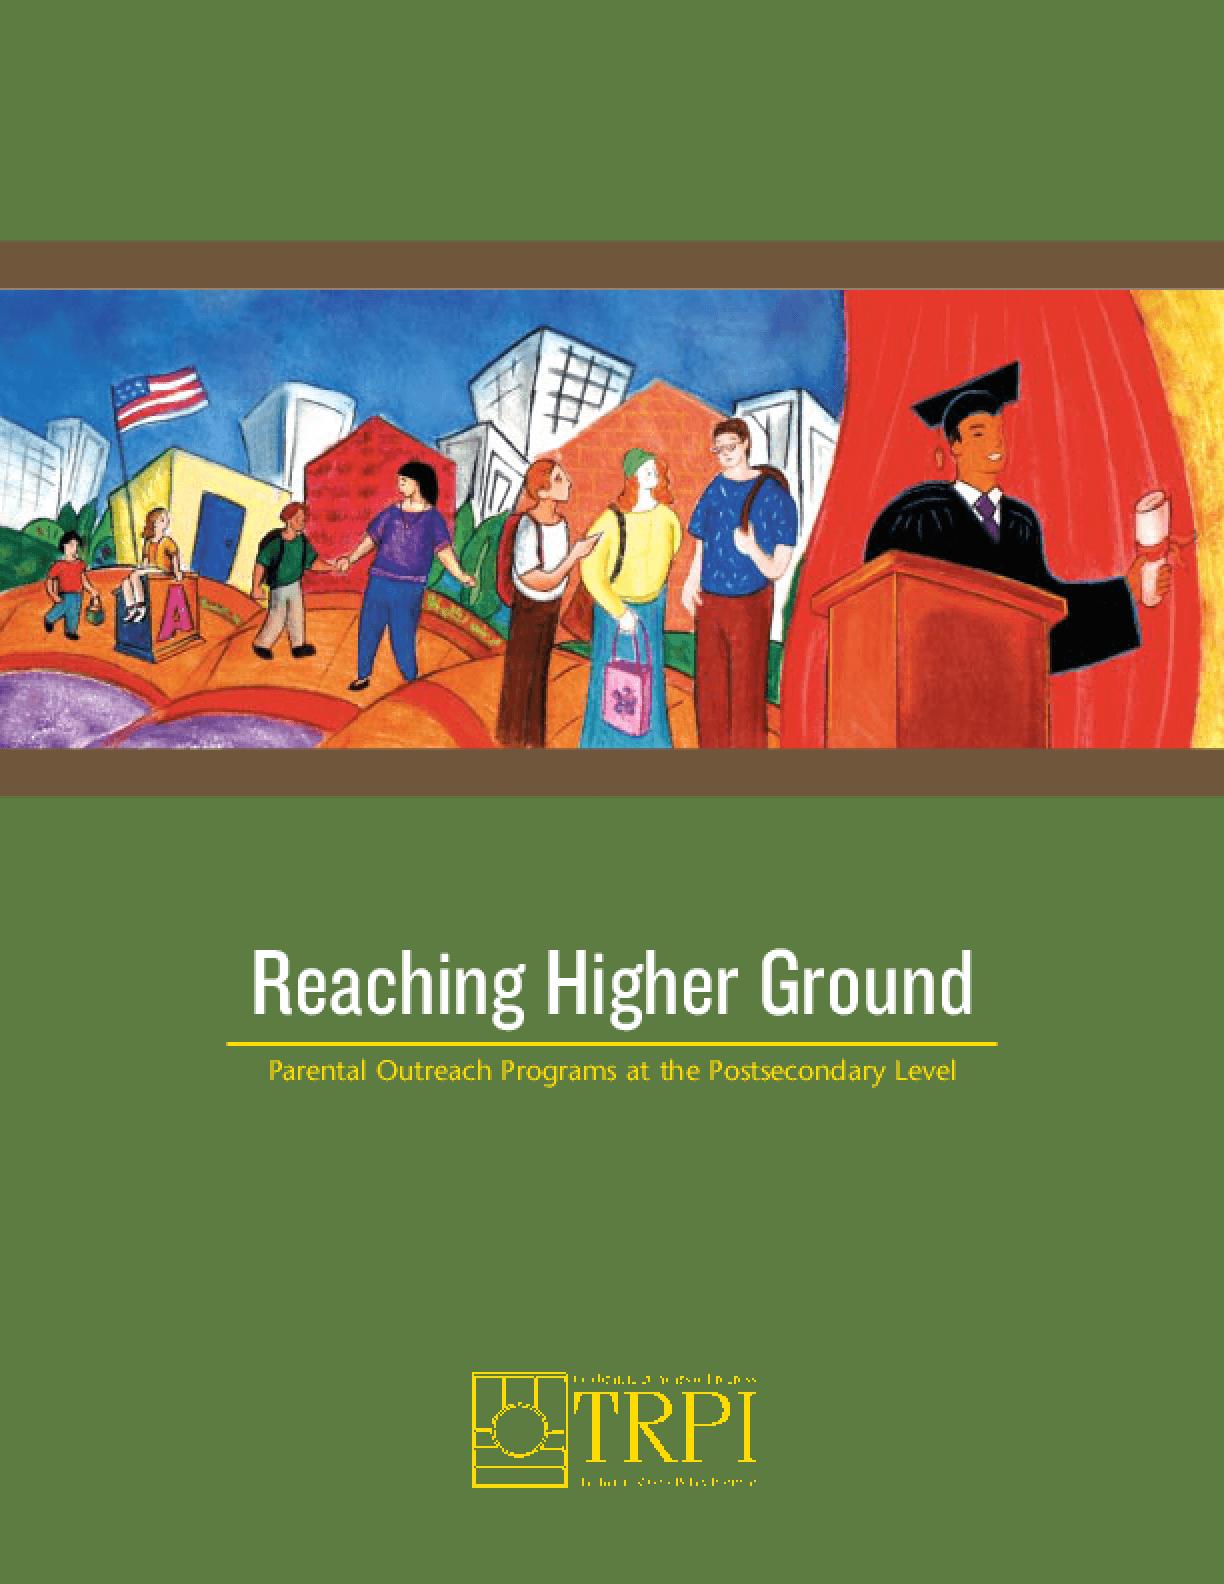 Reaching Higher Ground